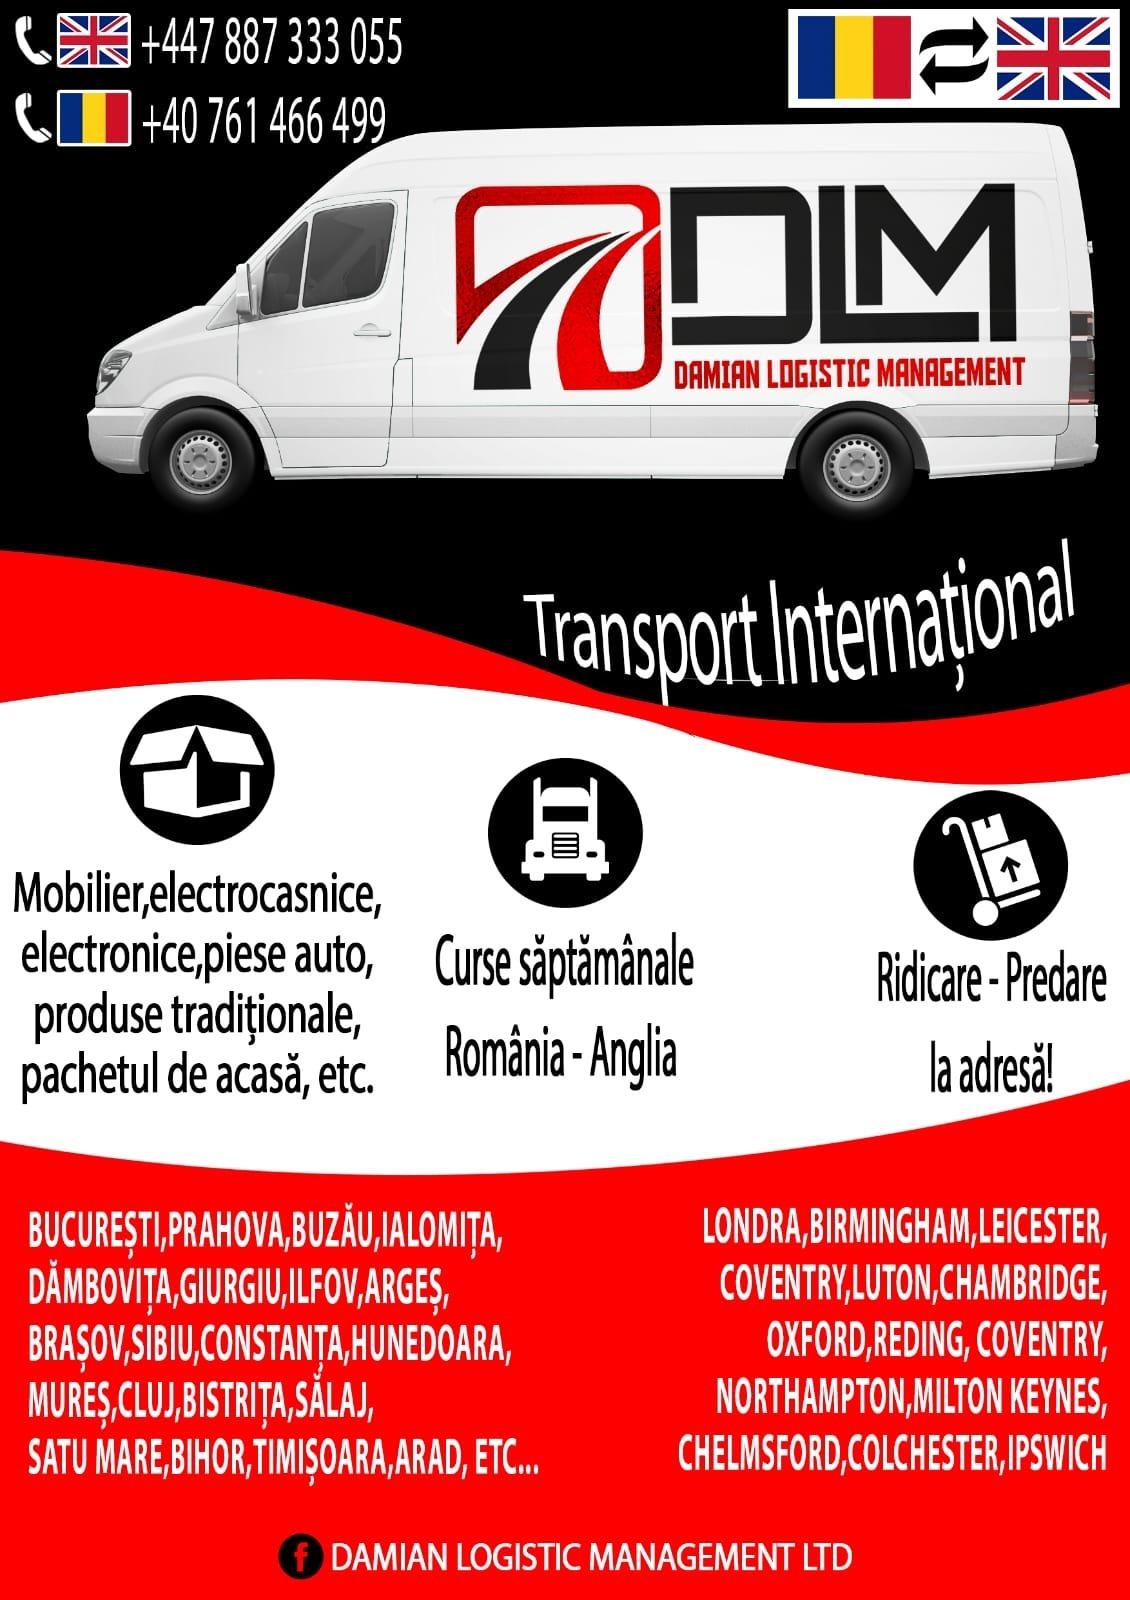 TRANSPORT INTERNATIONAL ROMANIA ANGLIA